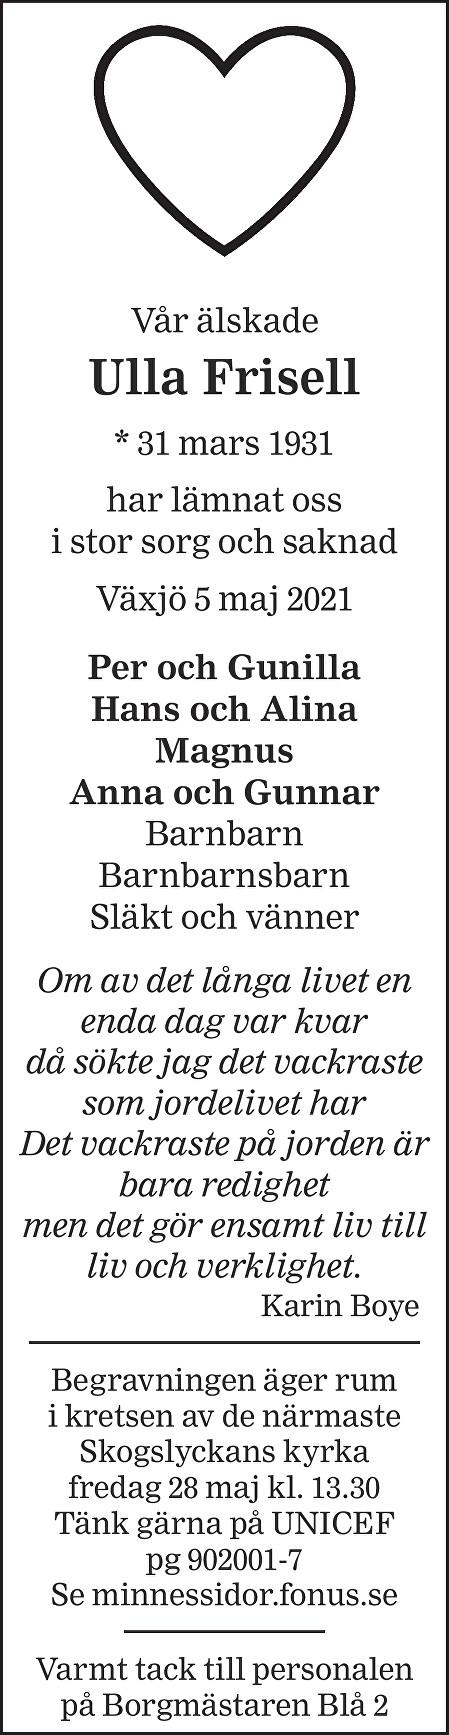 Ulla Frisell Death notice